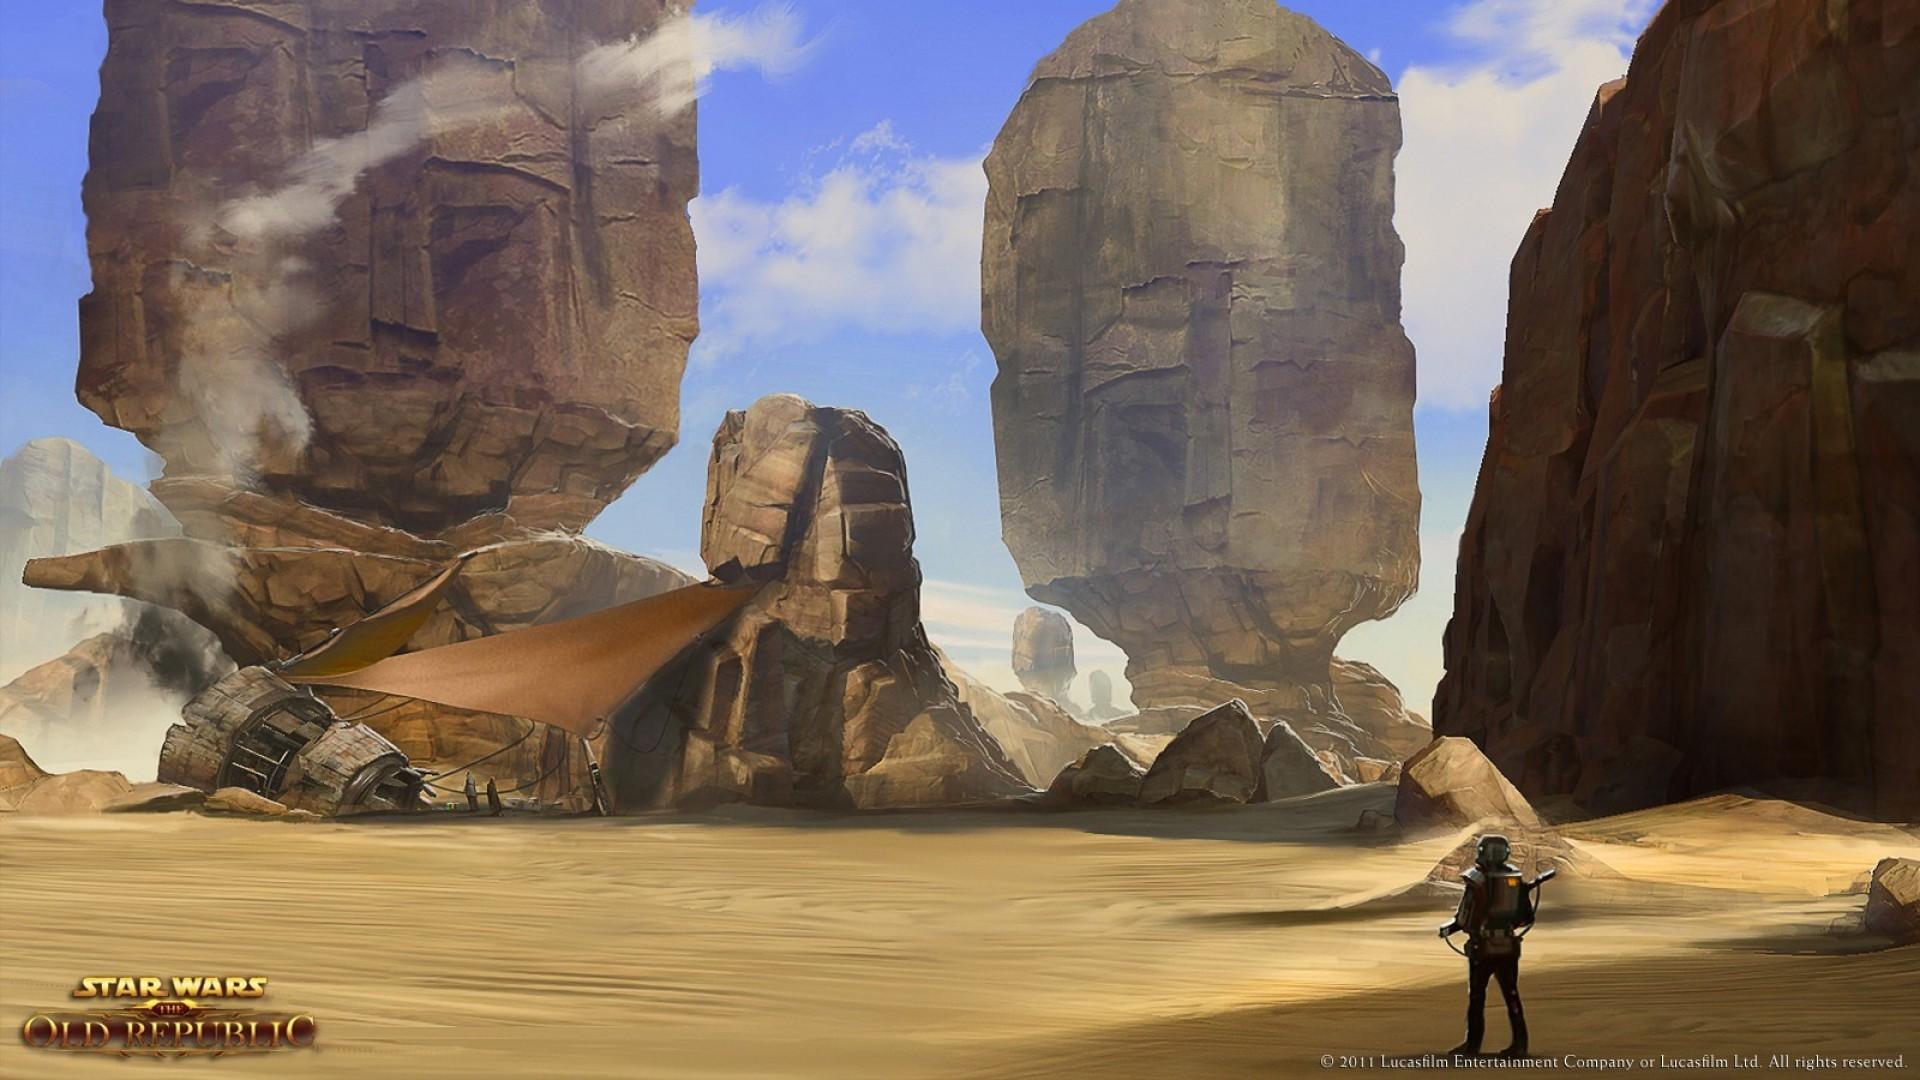 star wars concept art – Google Search   Star Wars   Pinterest   Star wars  concept art